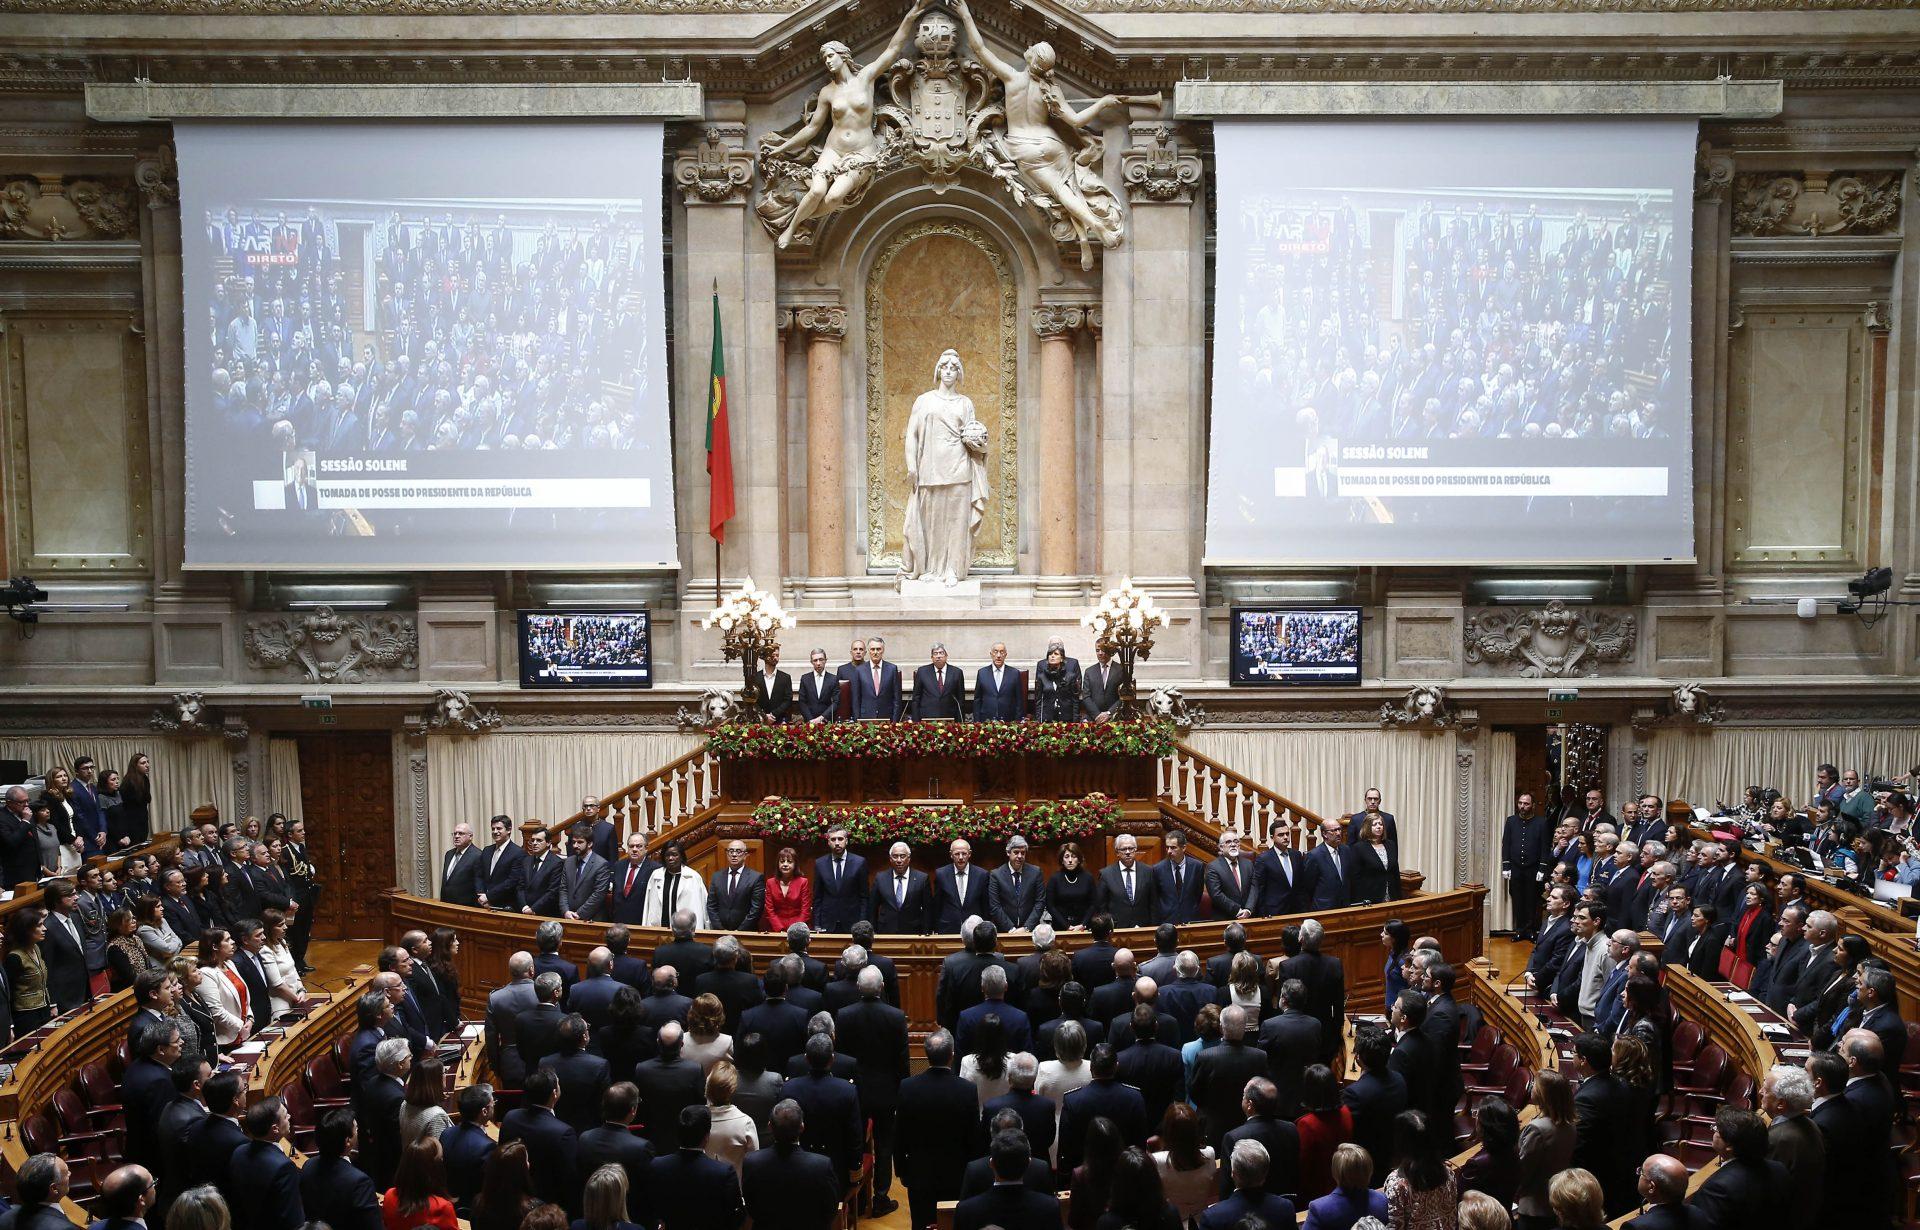 Parlamento recomenda ao Governo política ativa e eficaz para a Língua Portuguesa